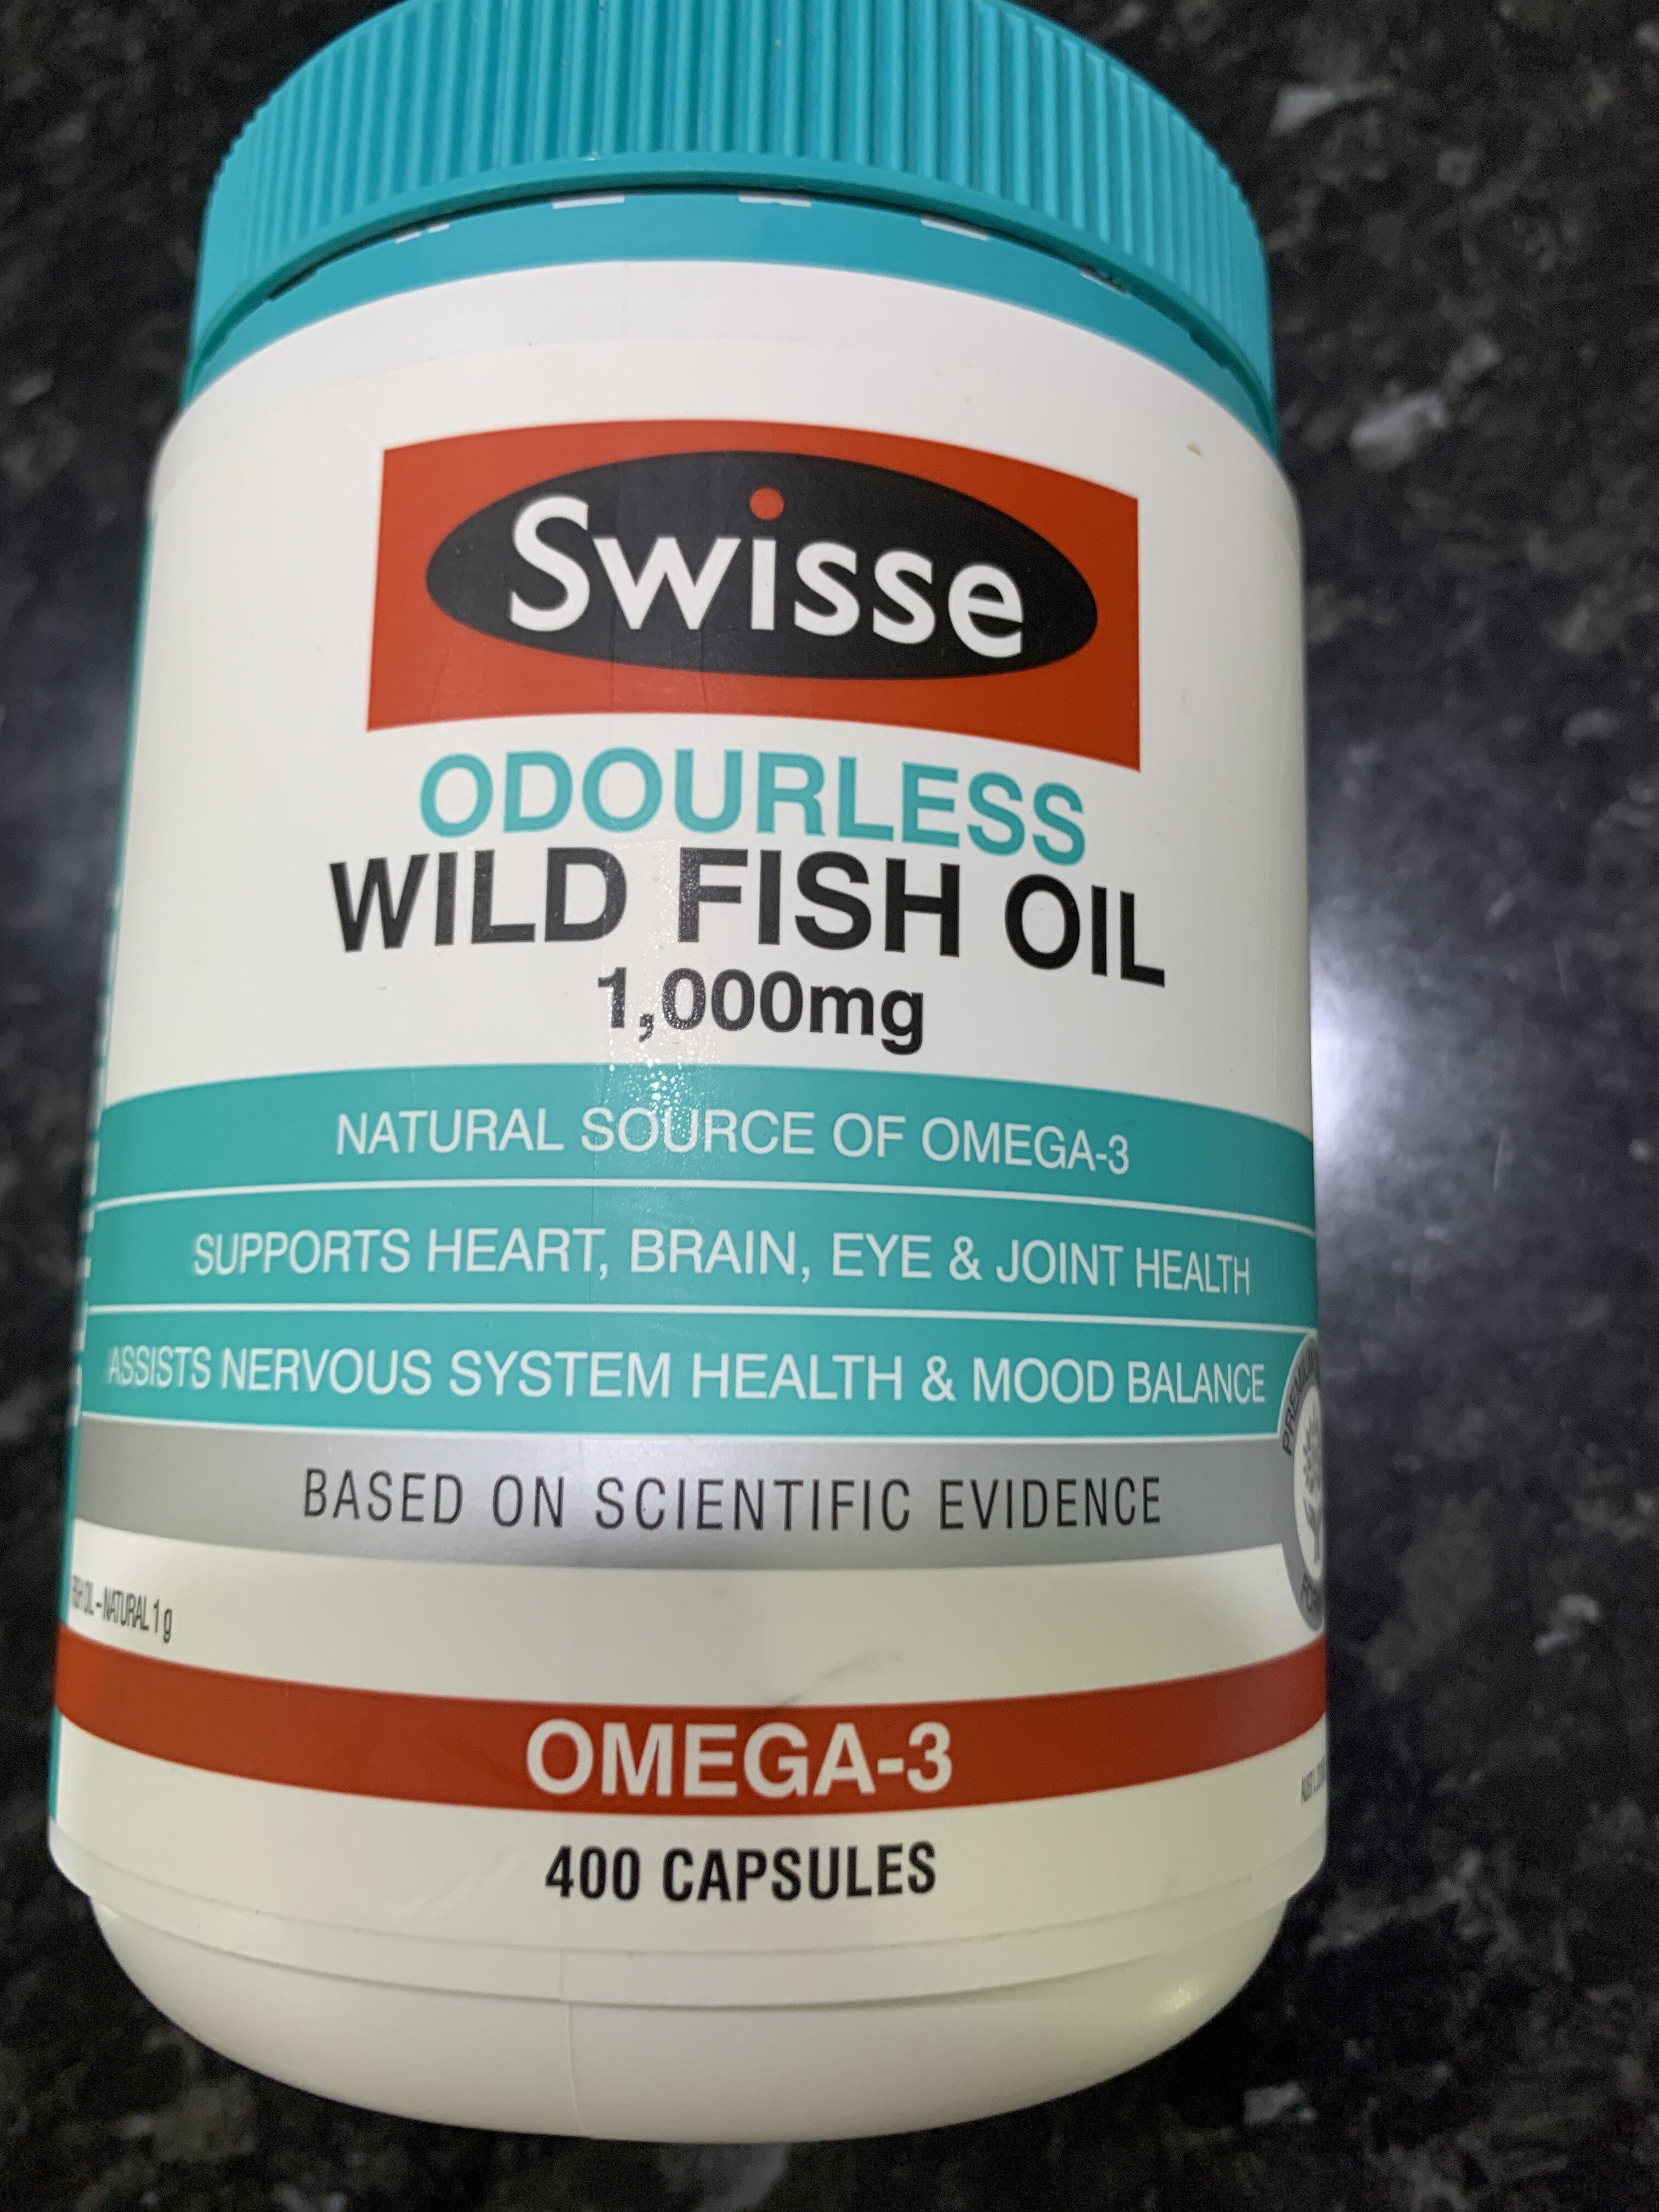 Odourless wild fish oil - Product - en